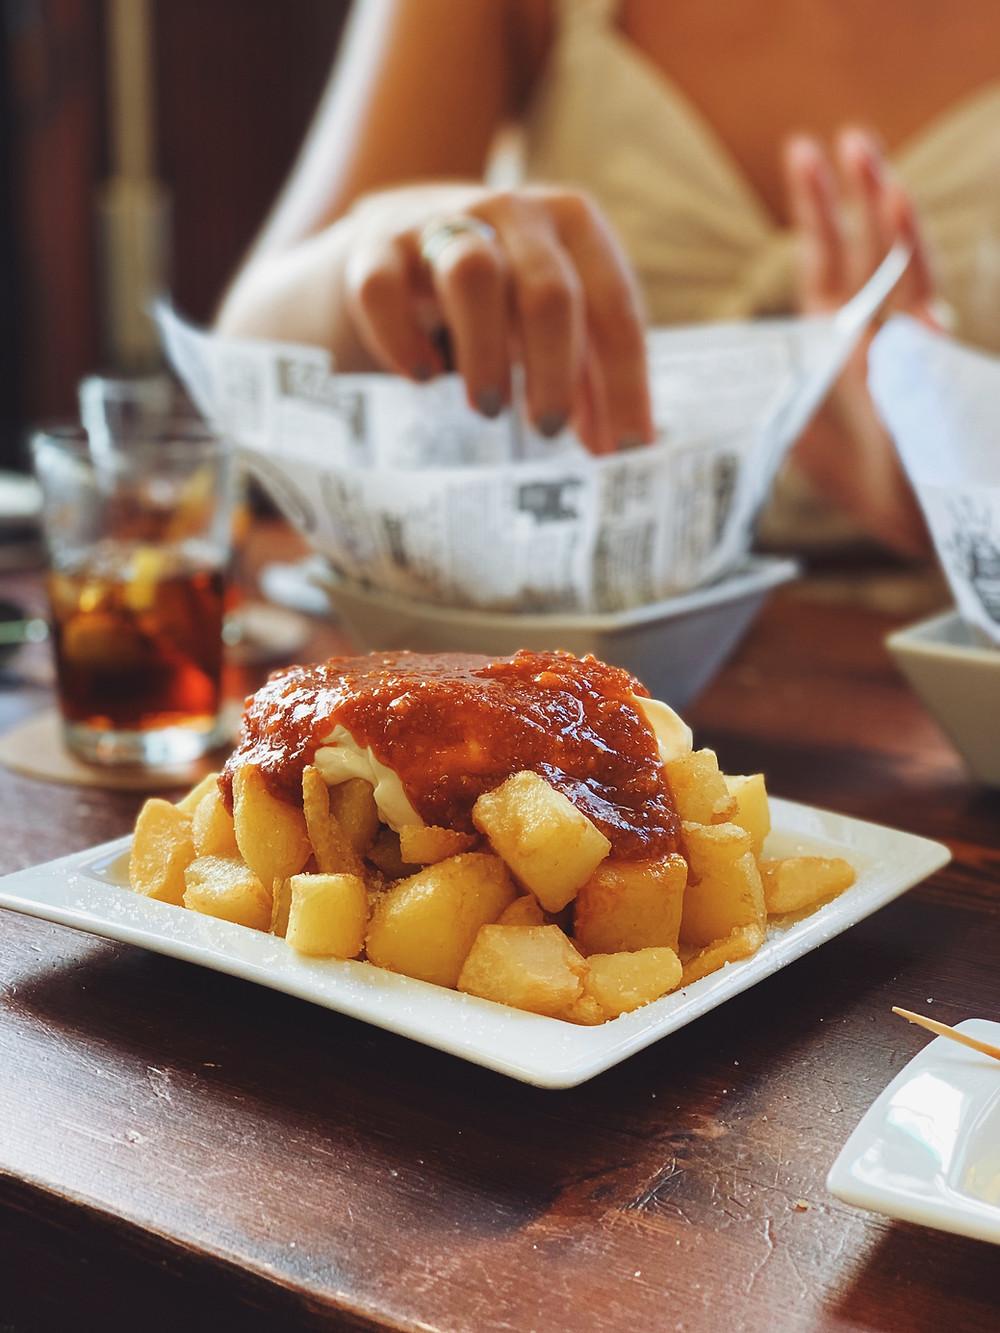 Patatas bravas, tra le tapas spagnole più conosciute